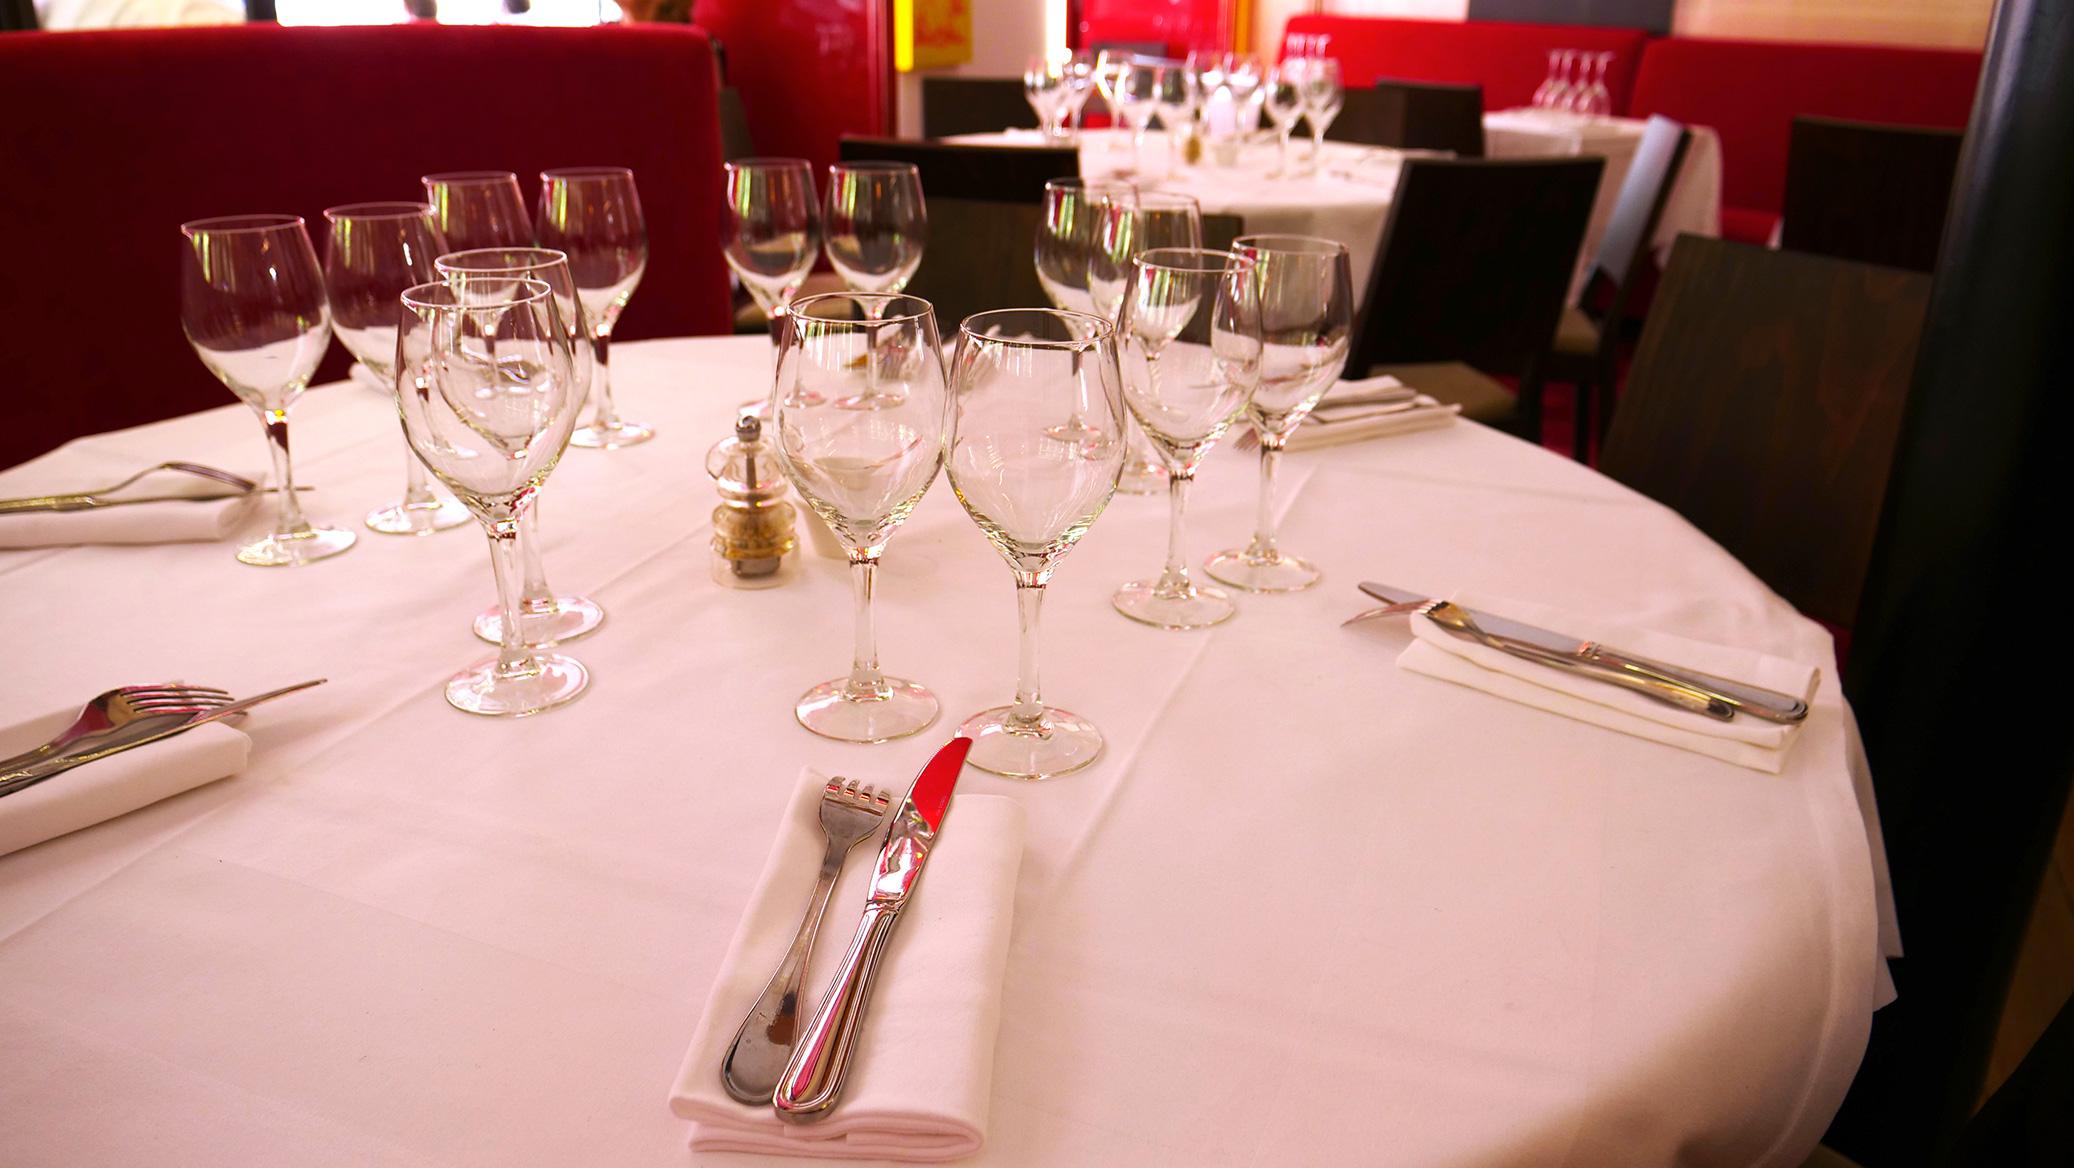 Table L'Aligot Paris 17